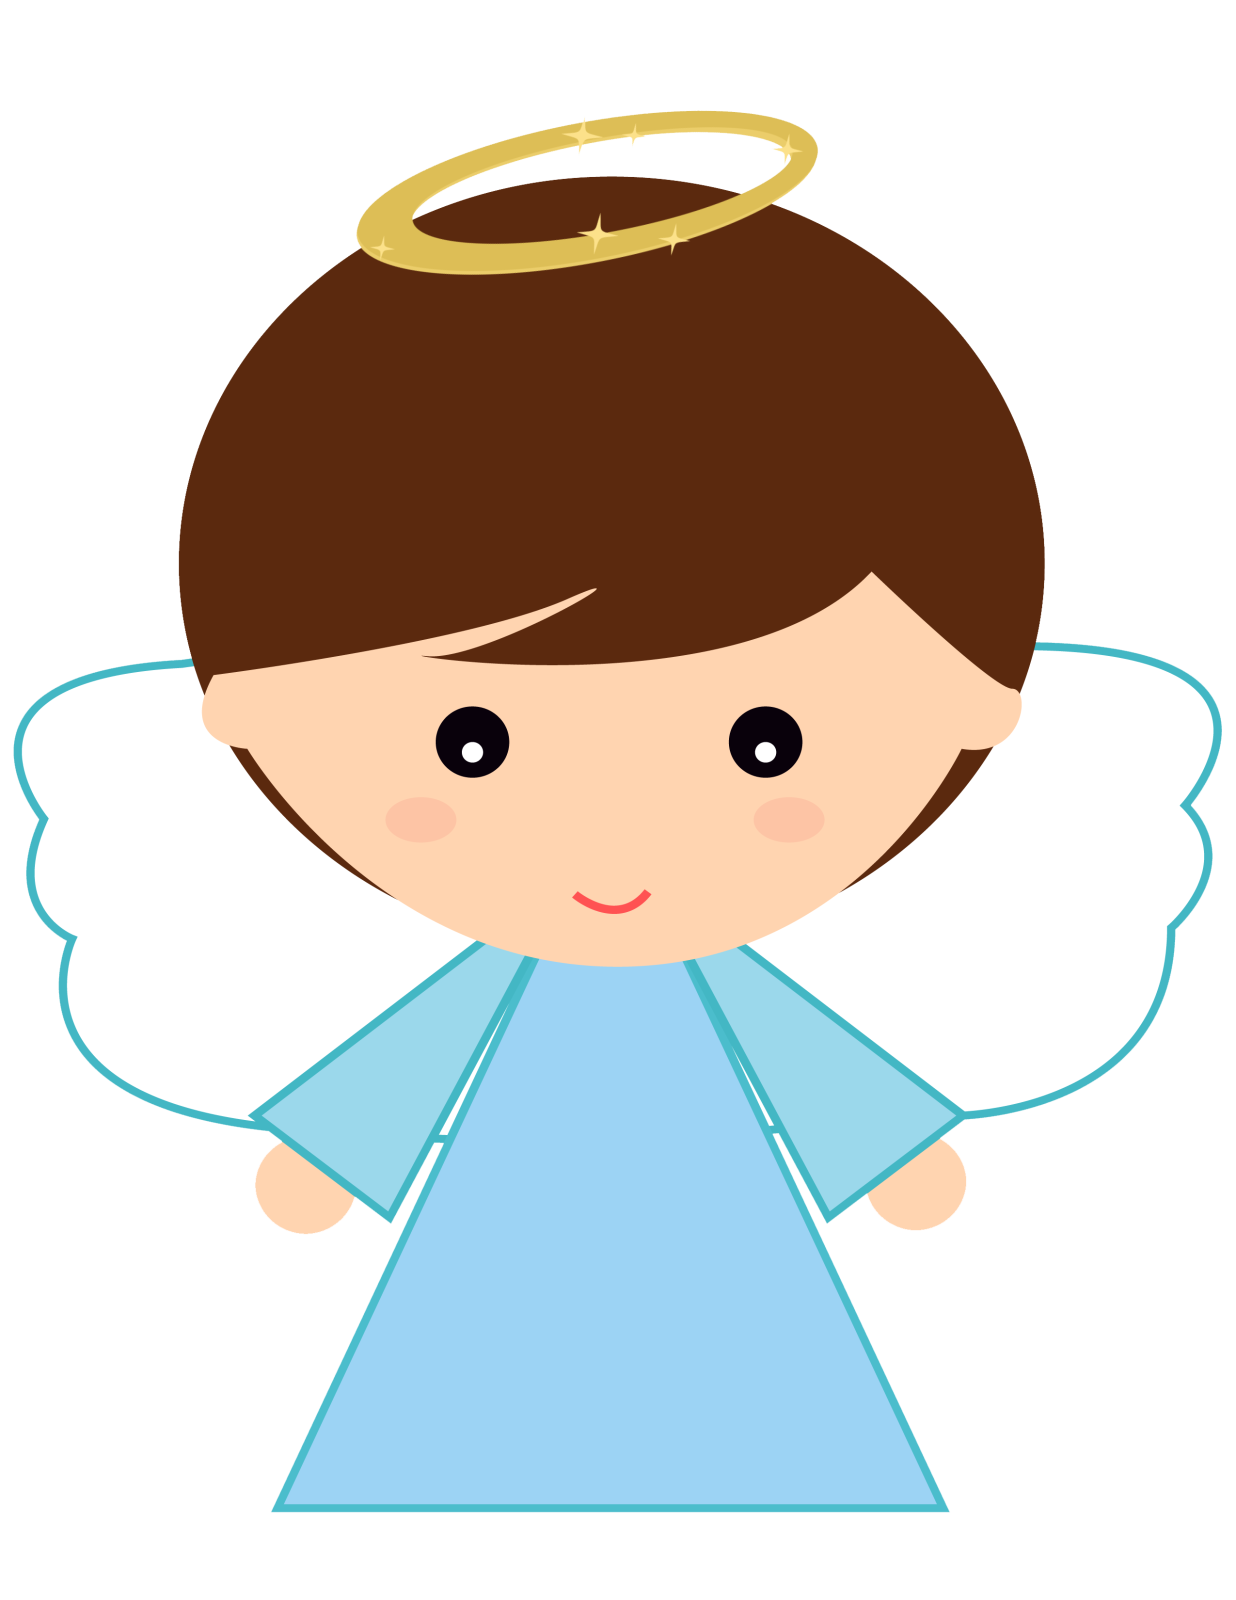 la casita de. Kid clipart angel